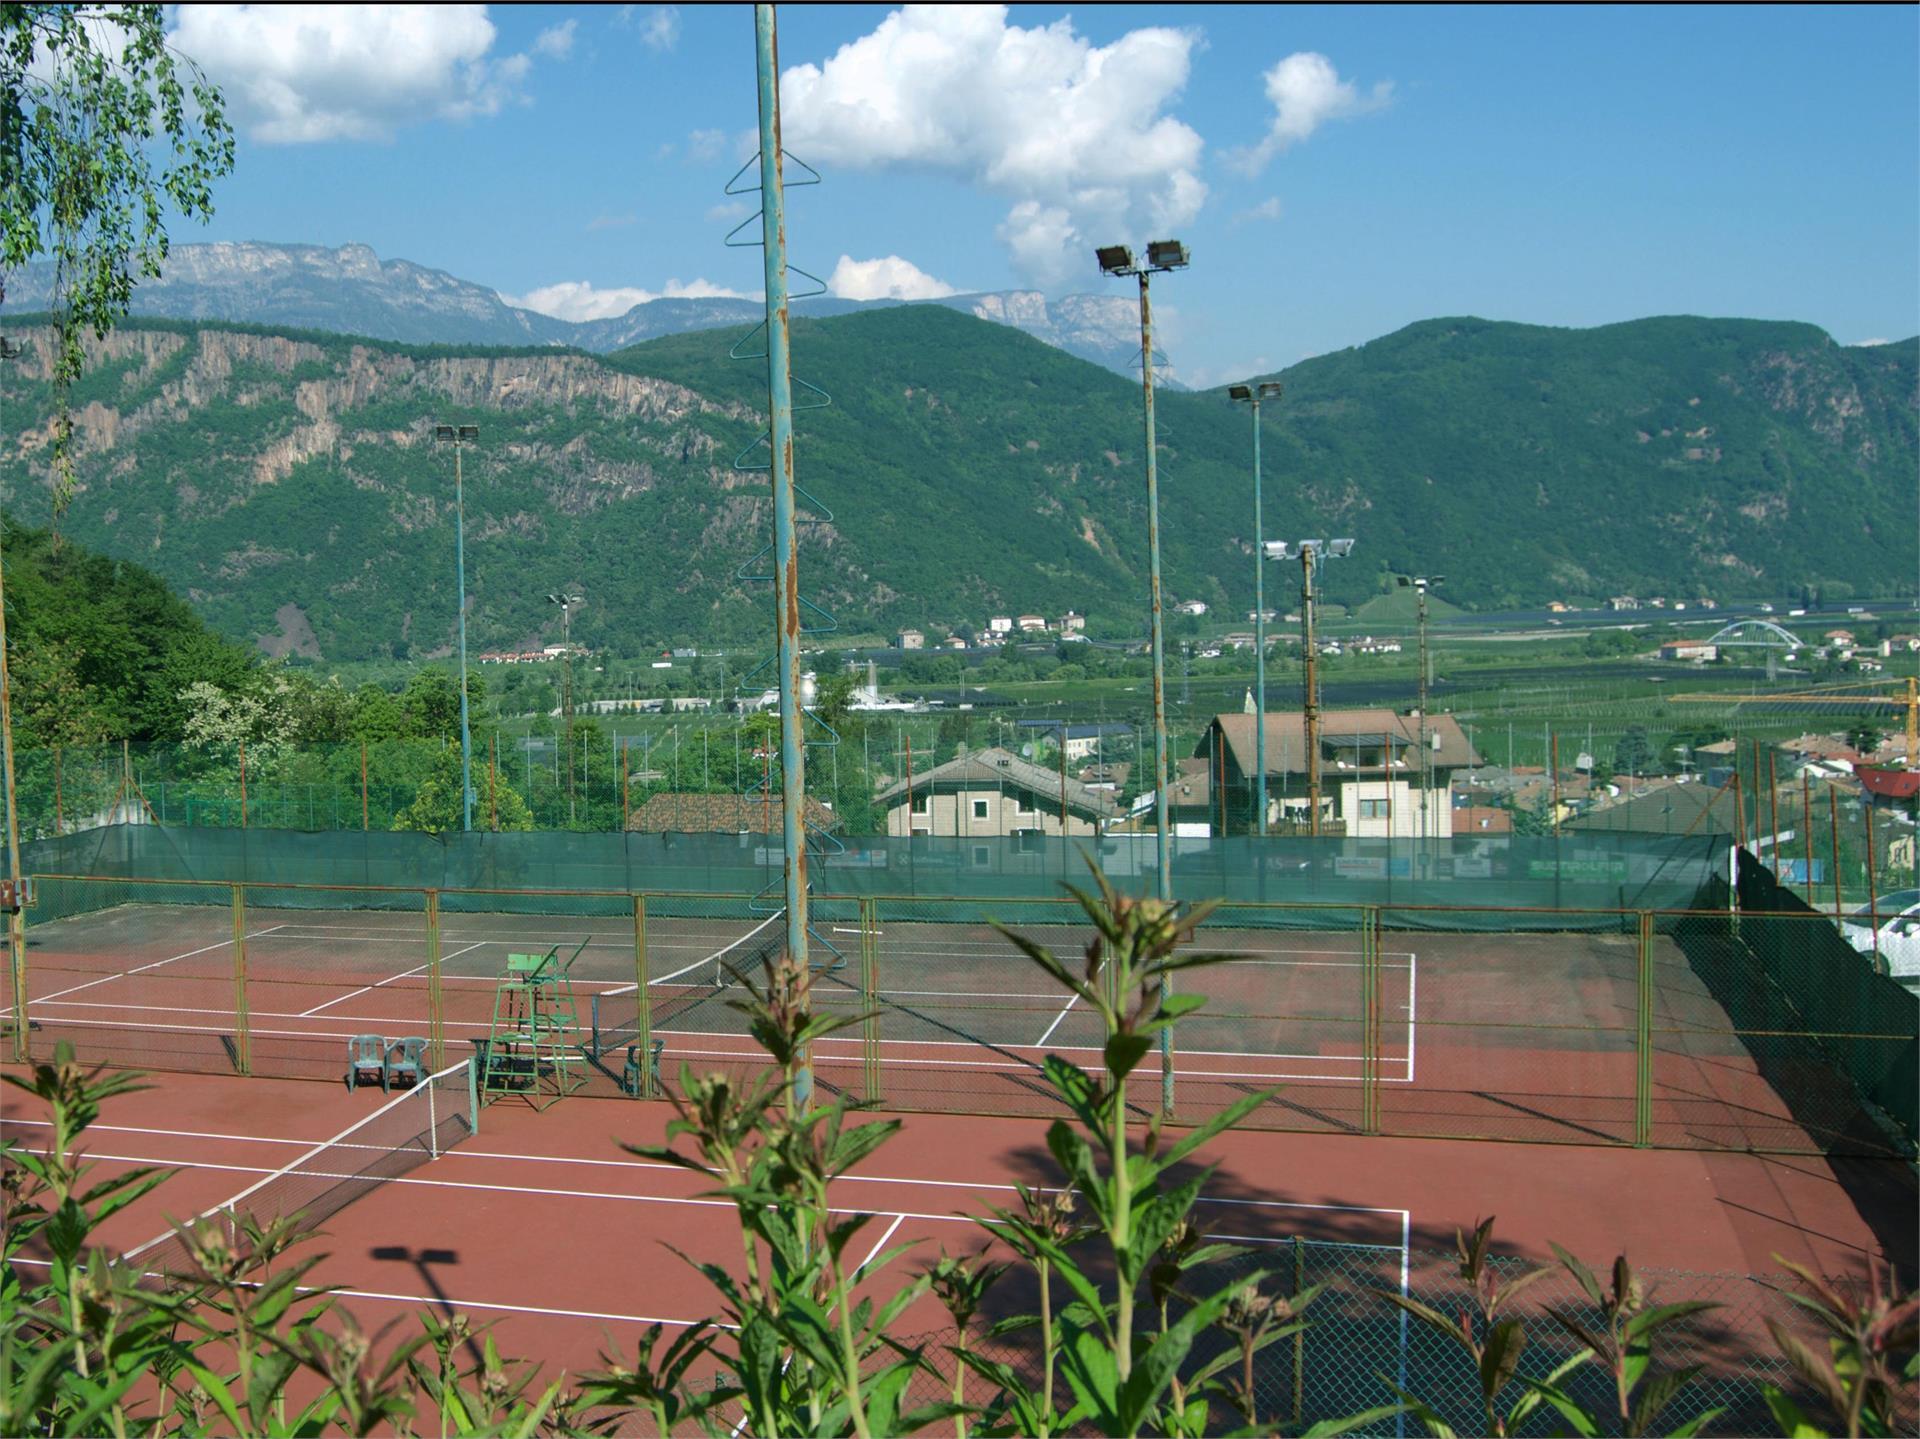 Tennis Club Branzoll/Bronzolo